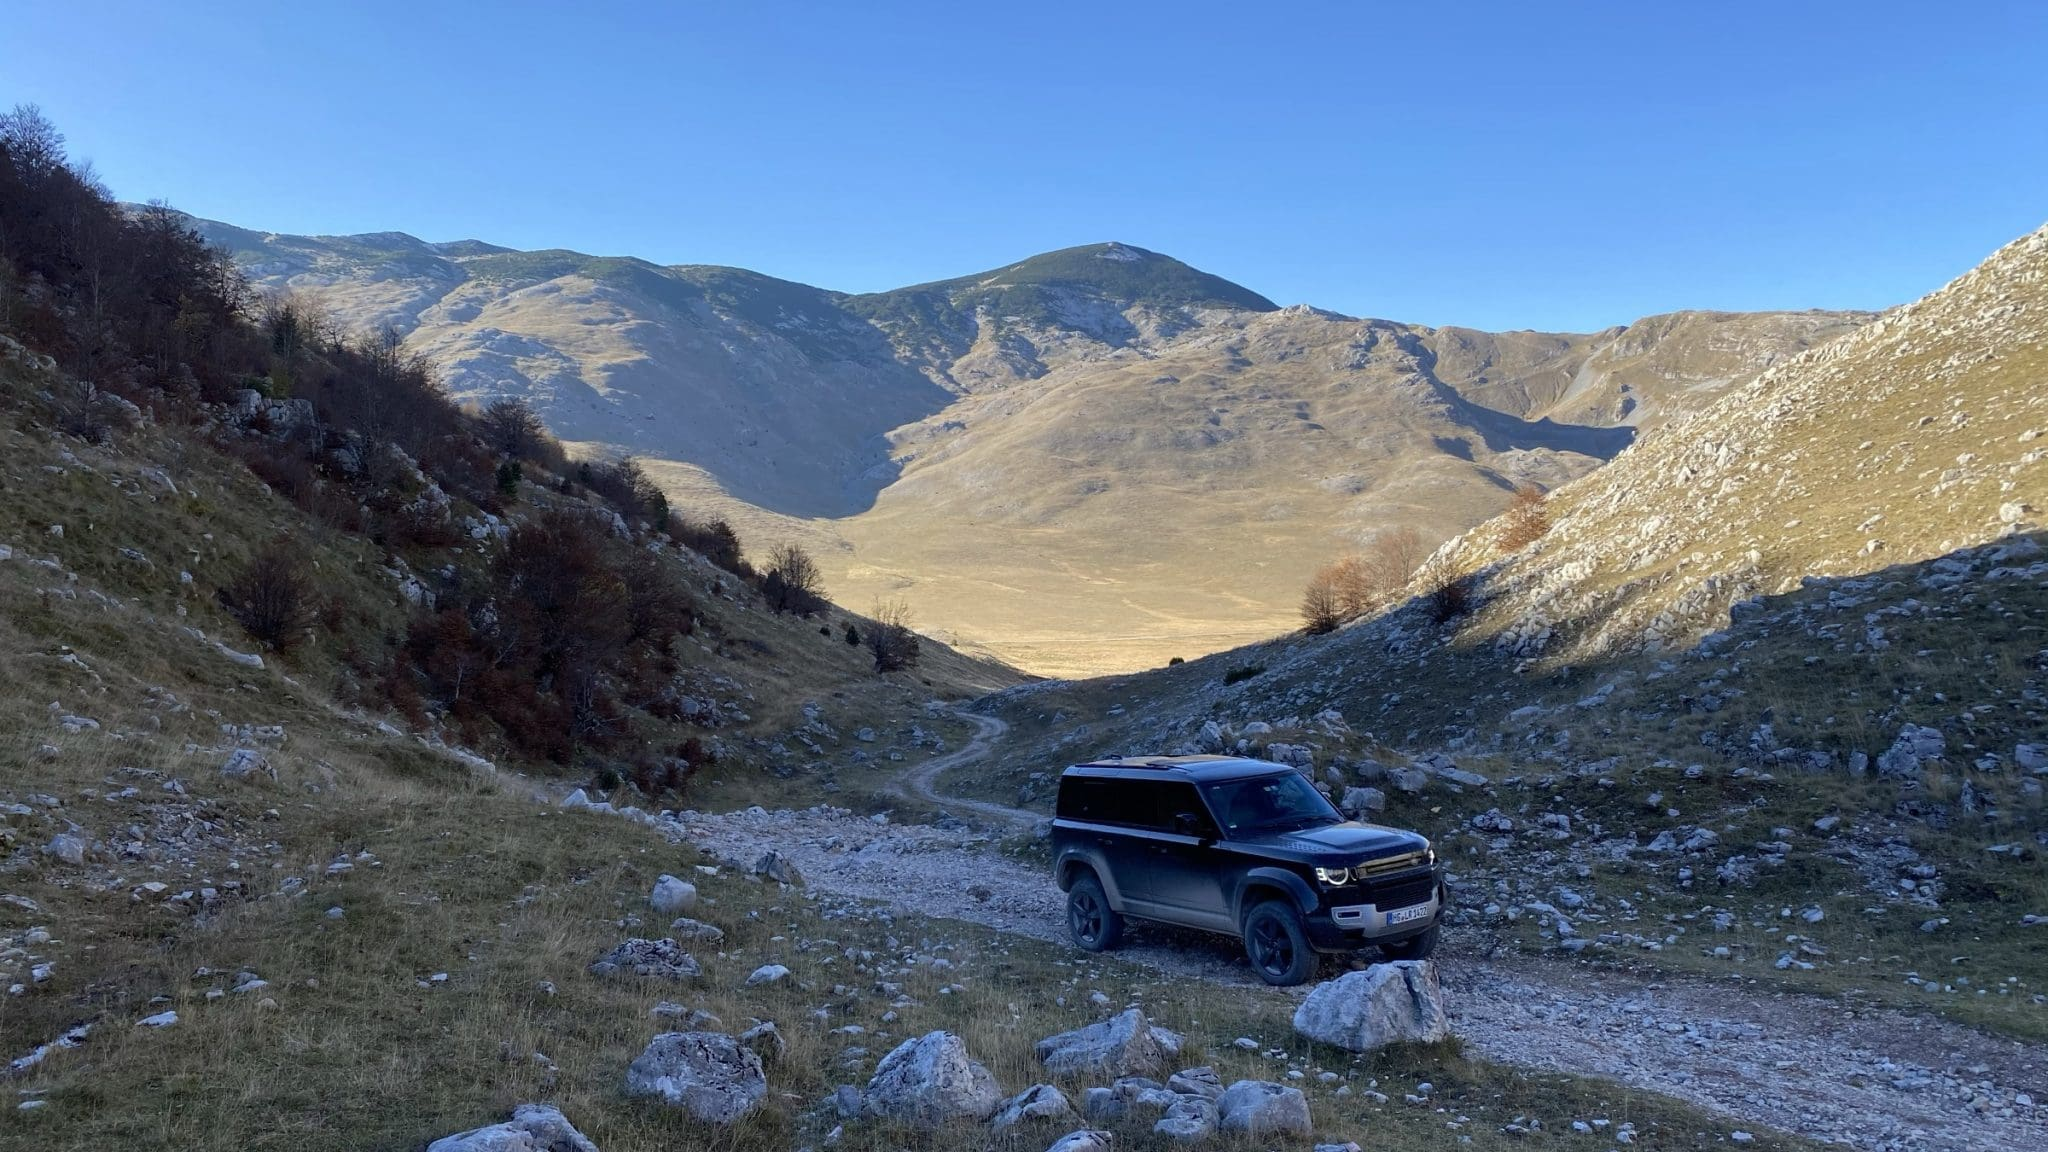 So close to heaven - In The Mountain Village Lukomir 2